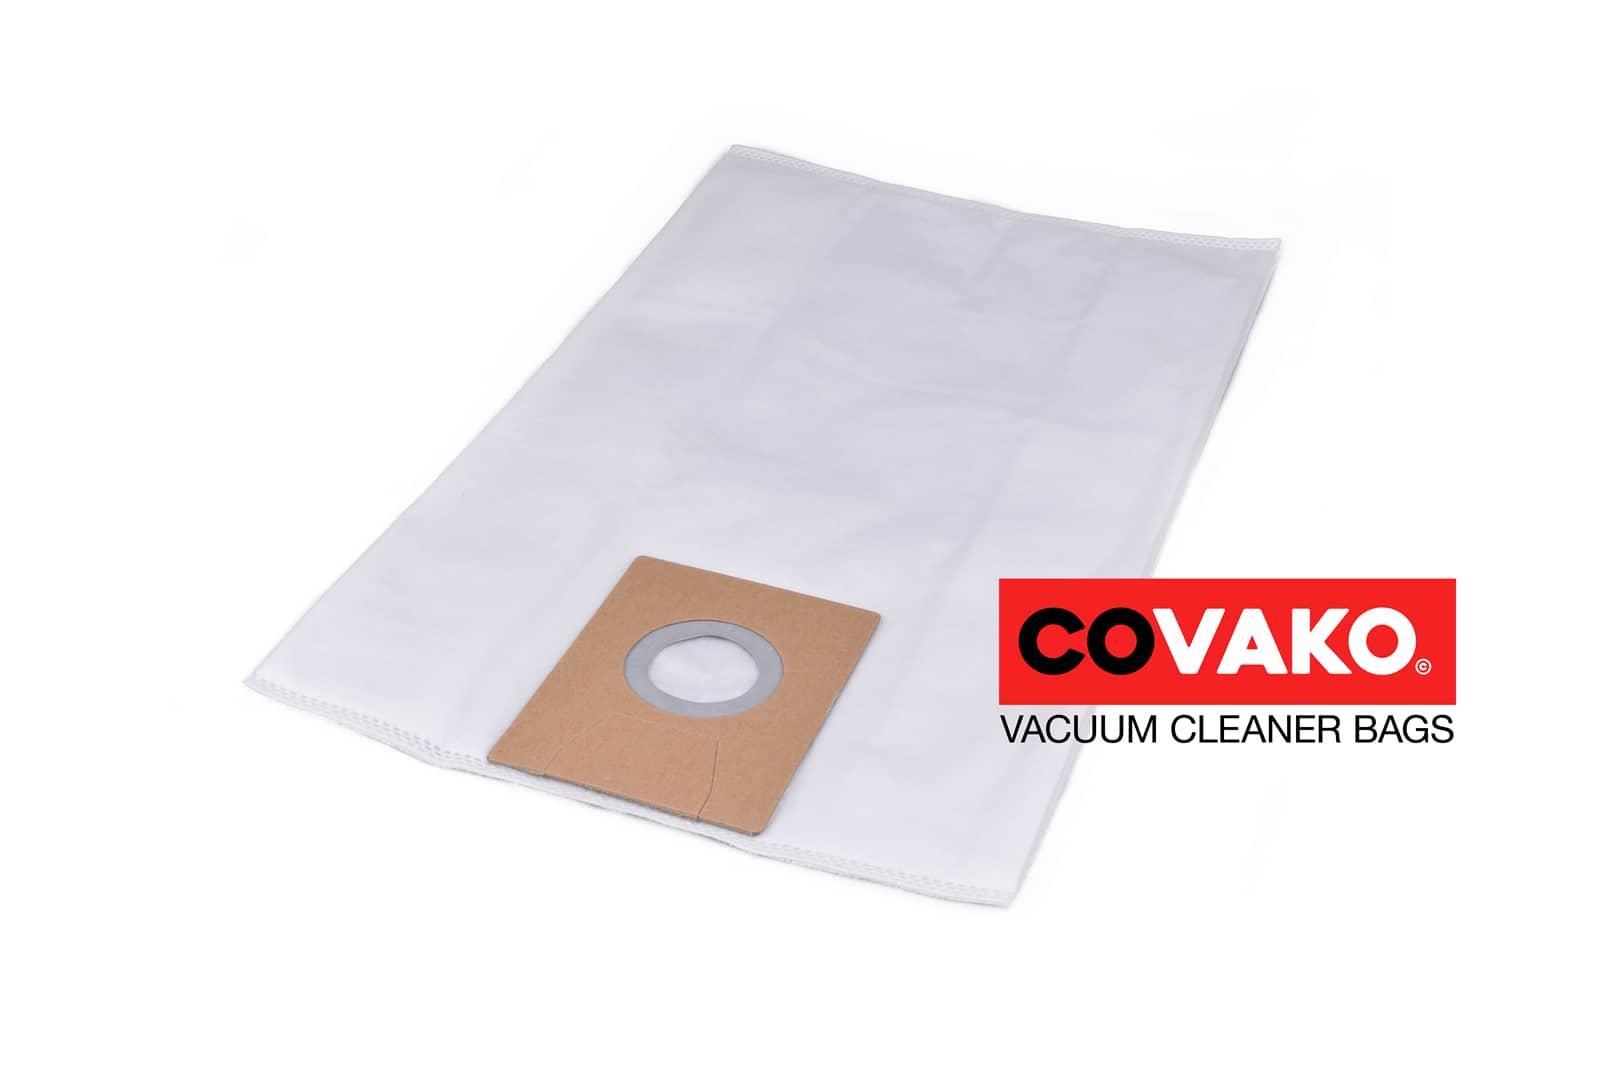 Remko RK 25 / Synthesis - Remko vacuum cleaner bags